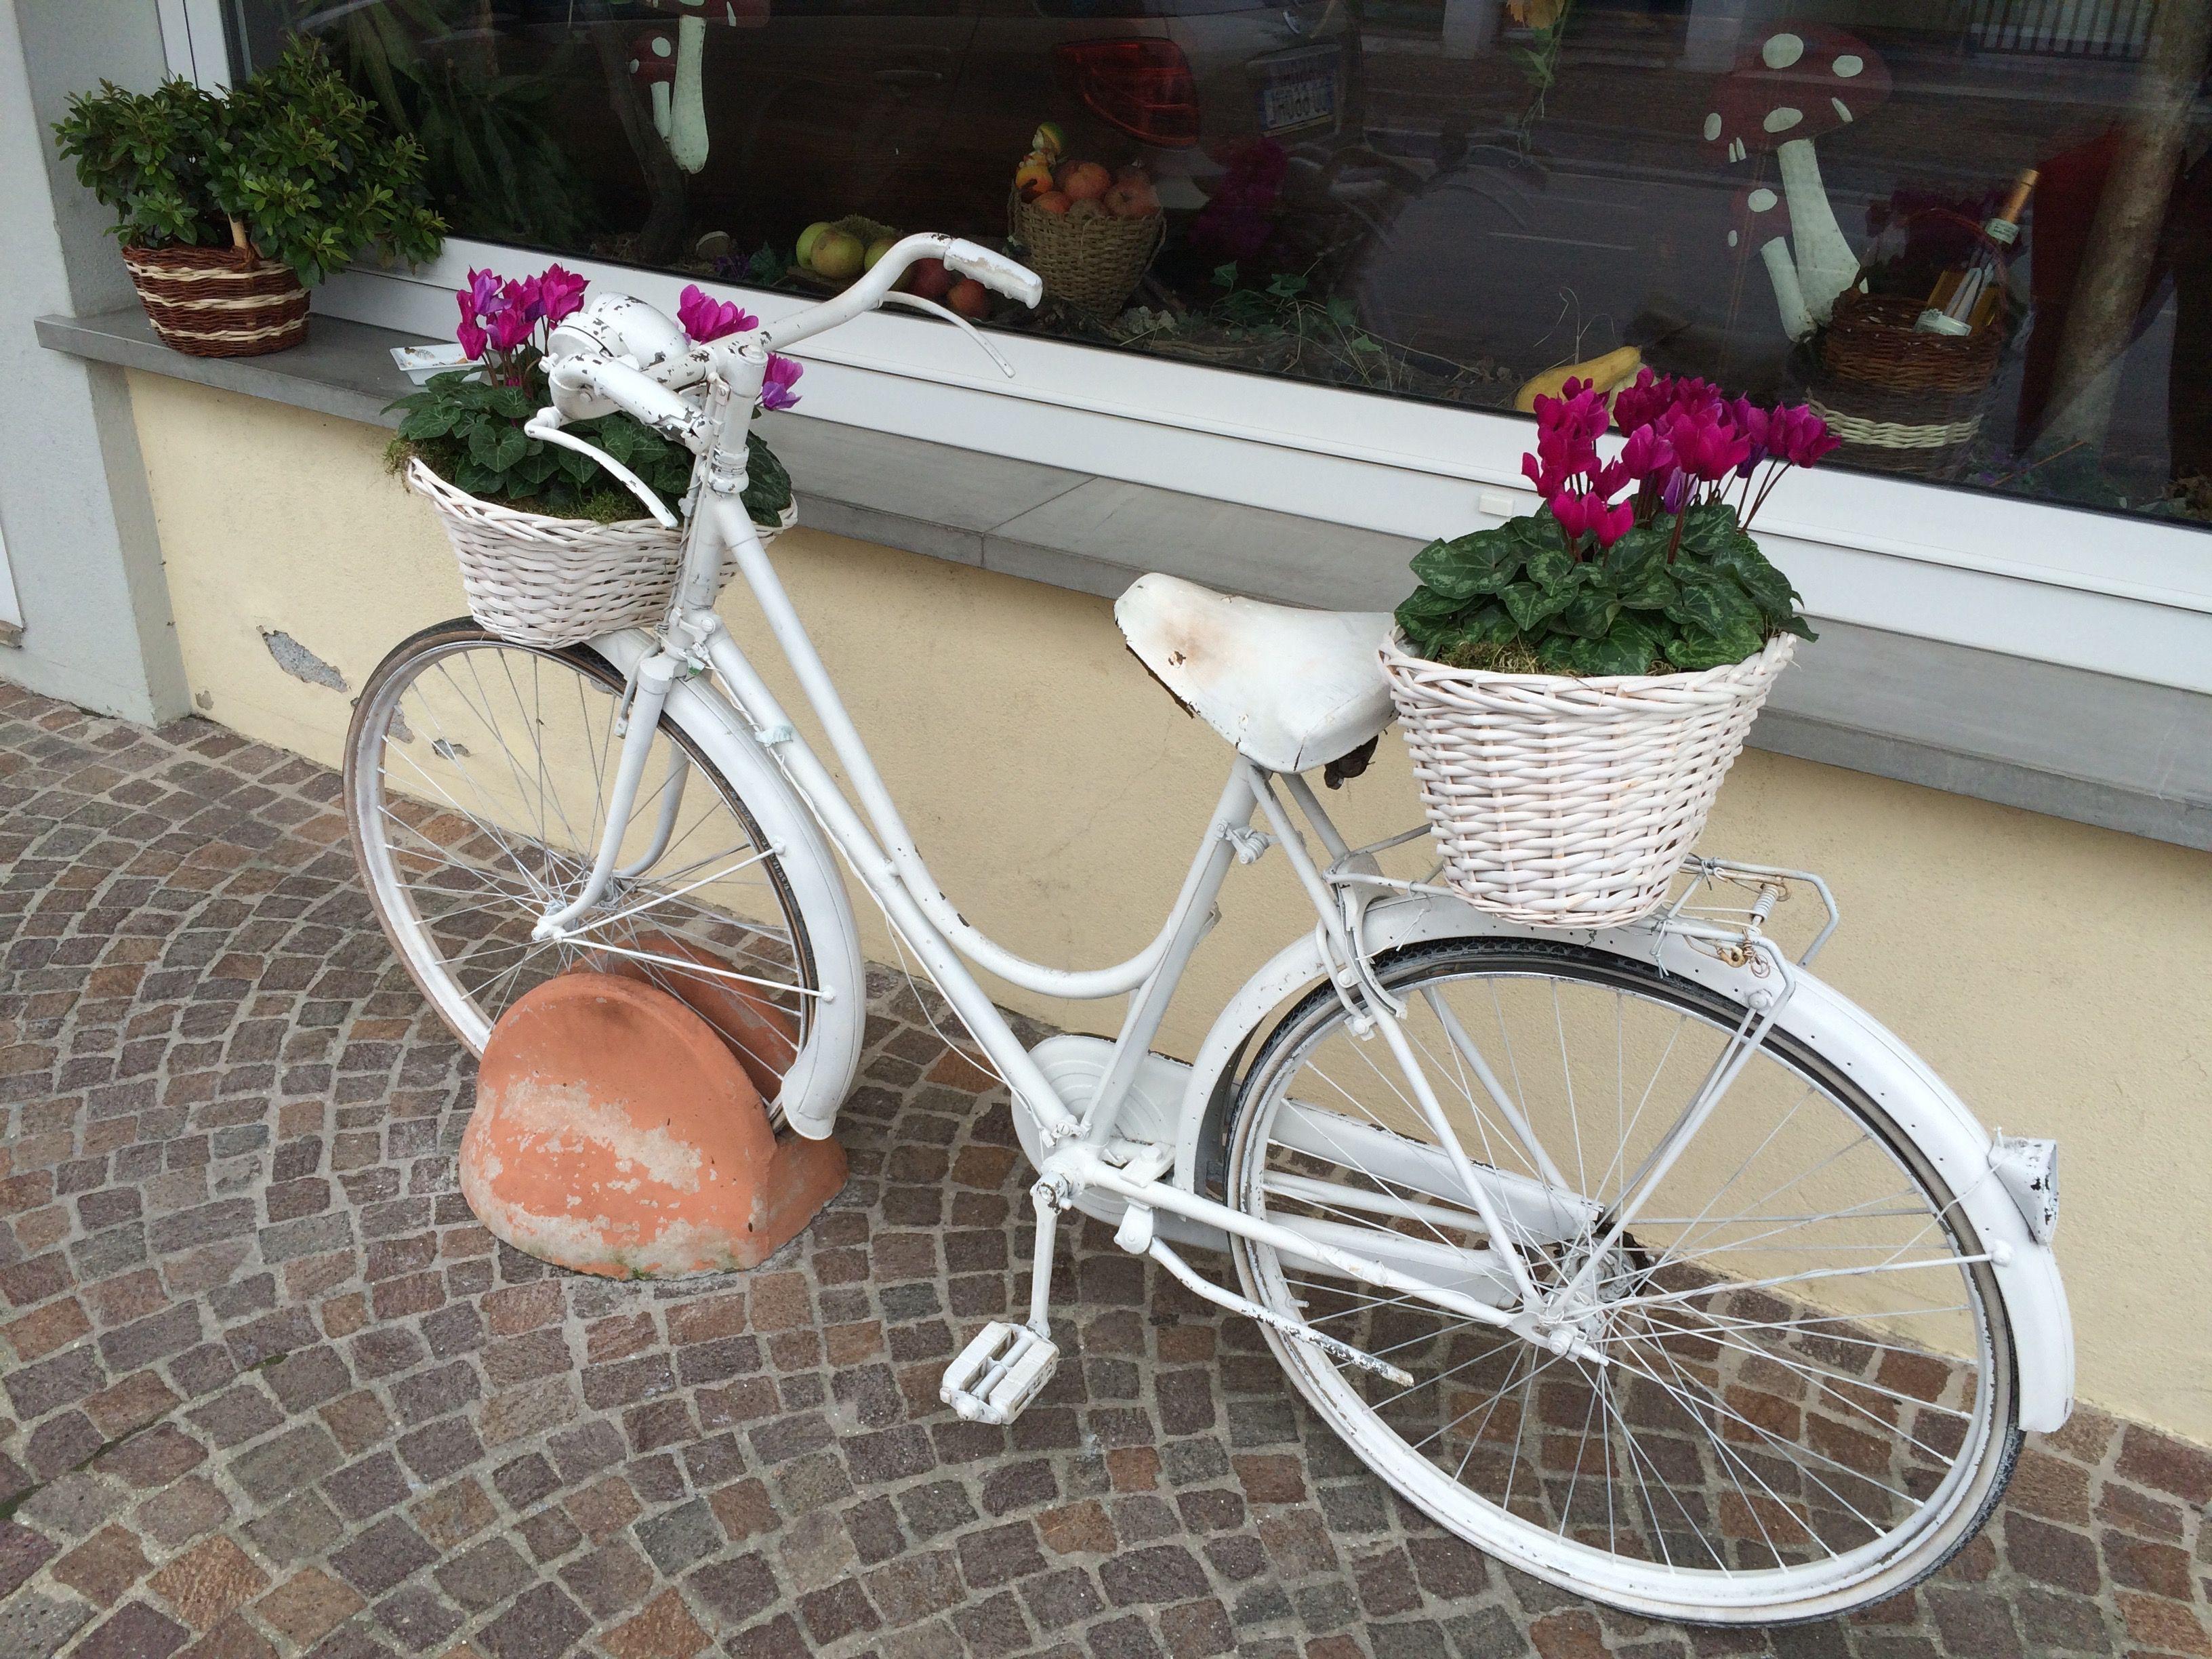 bicicletta a Tarcento (Udine, friuli)